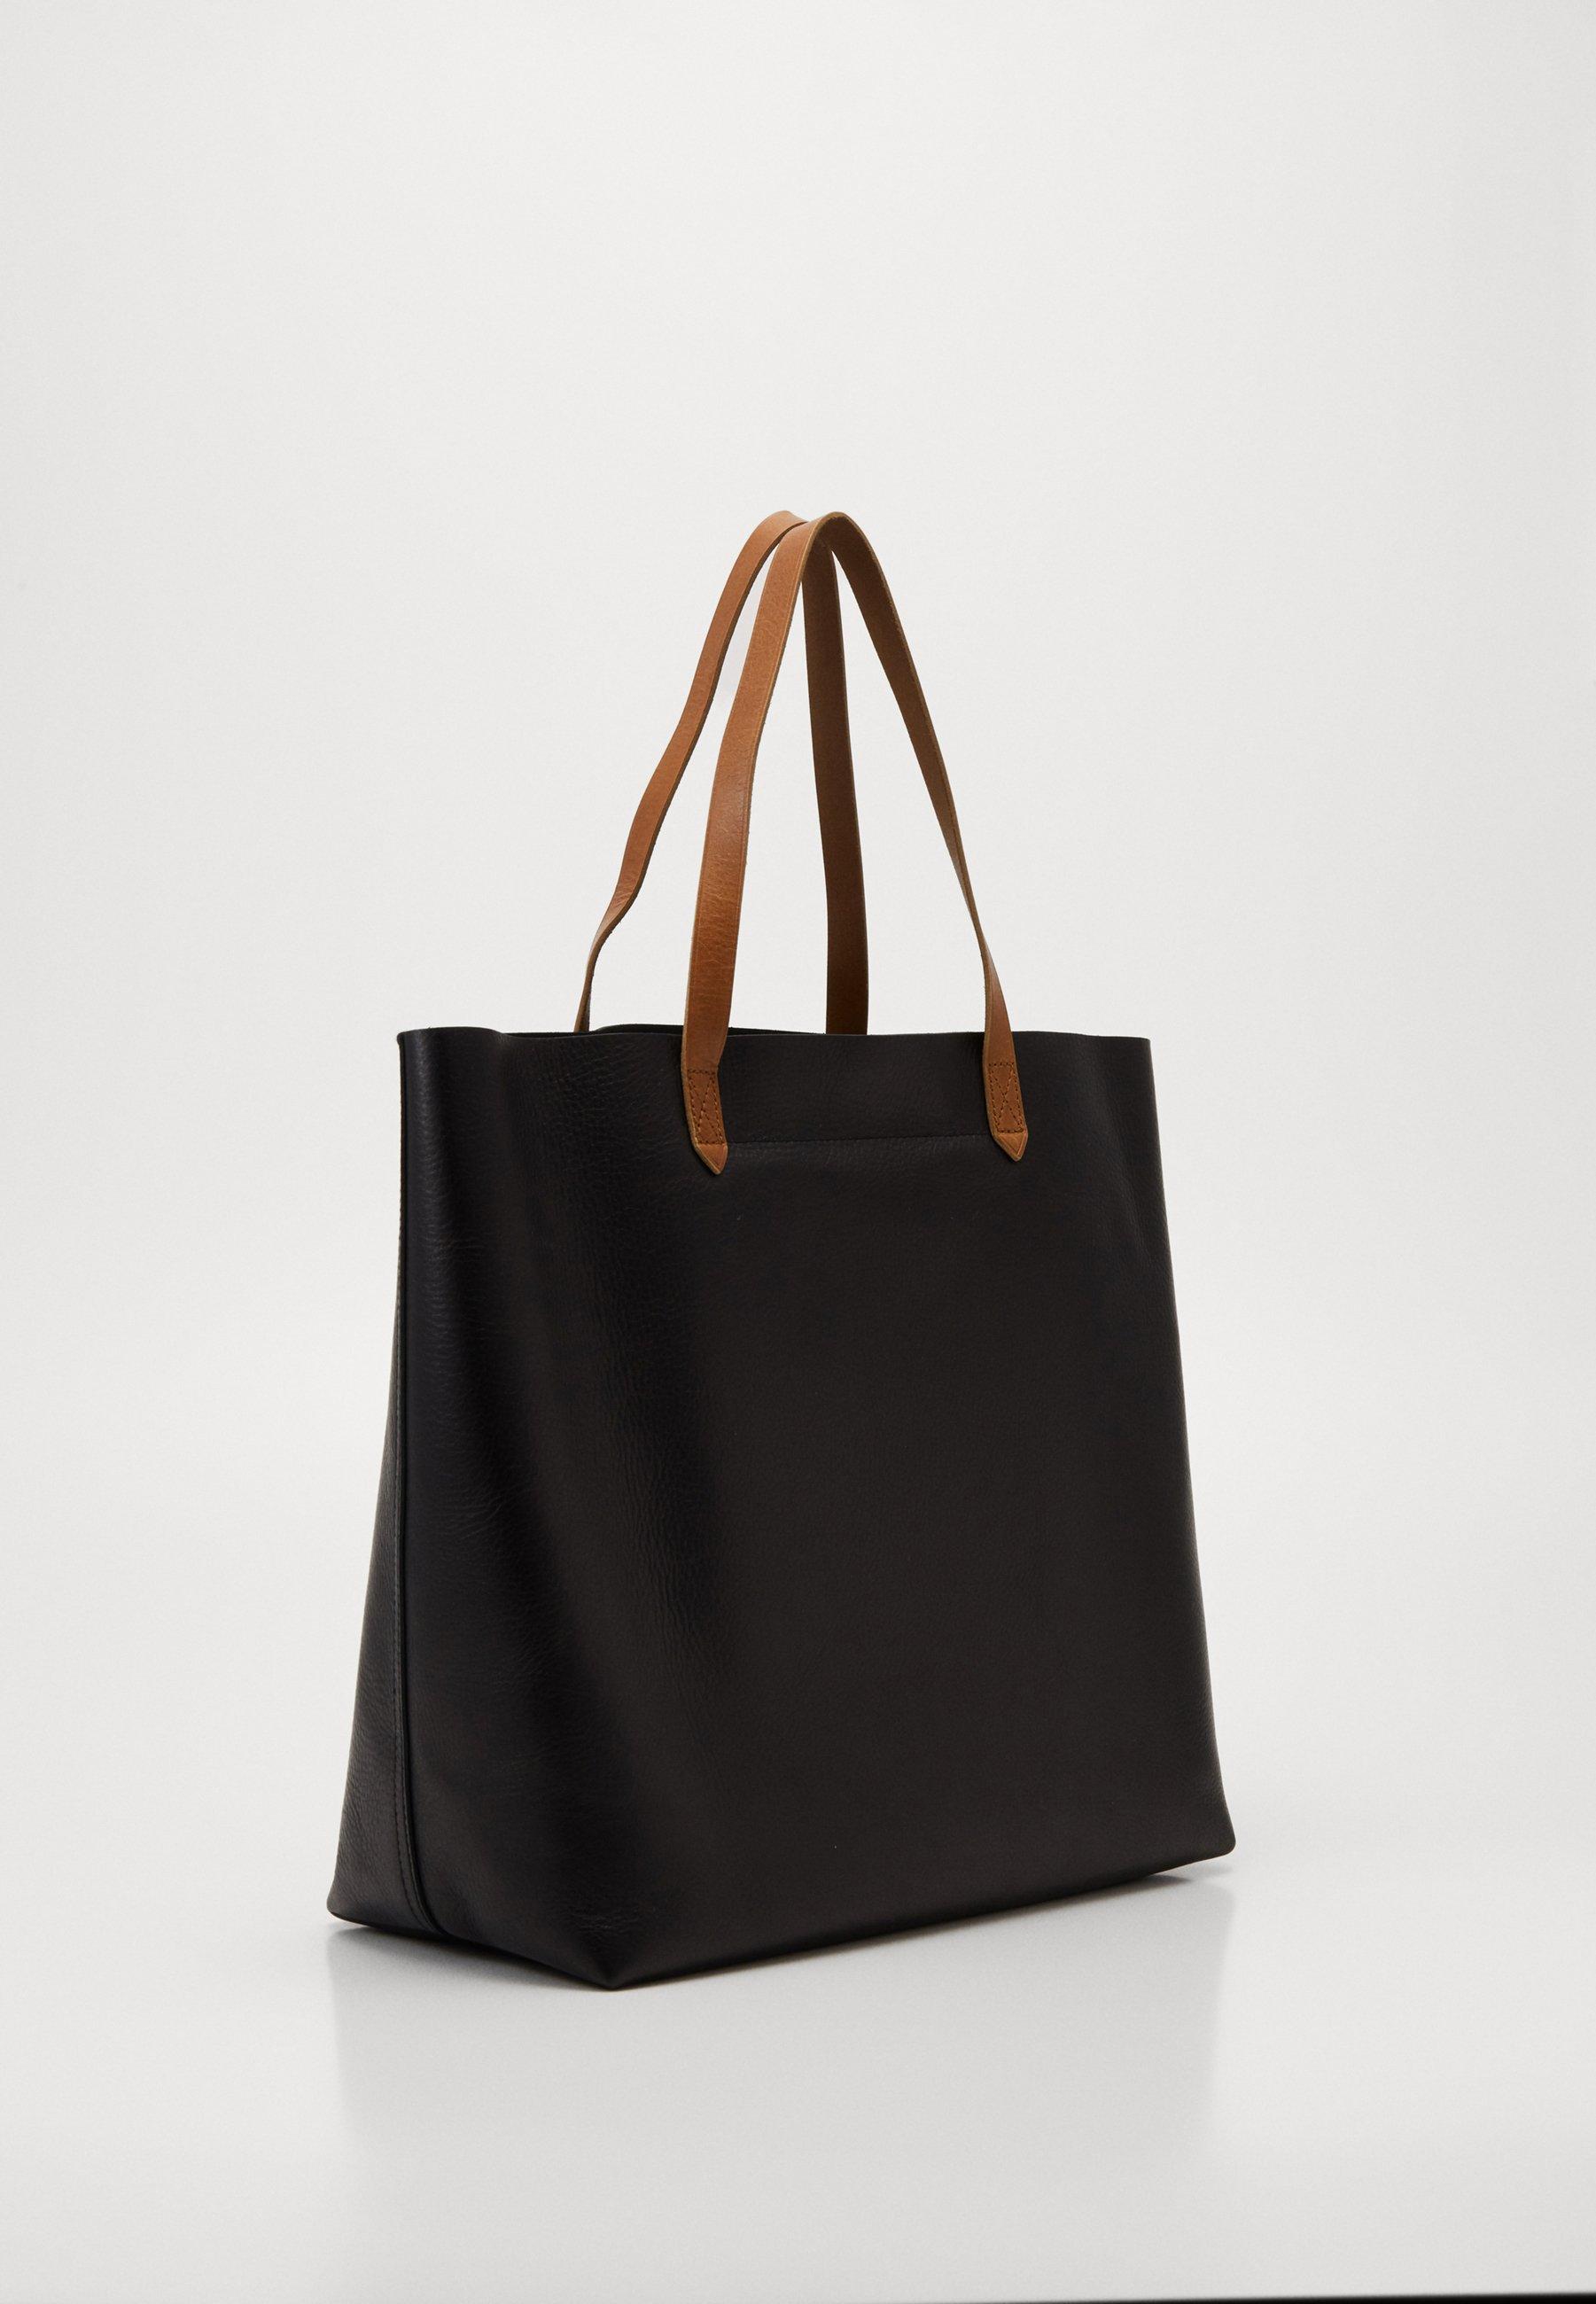 Madewell Transport Tote - Torba Na Zakupy True Black/brown